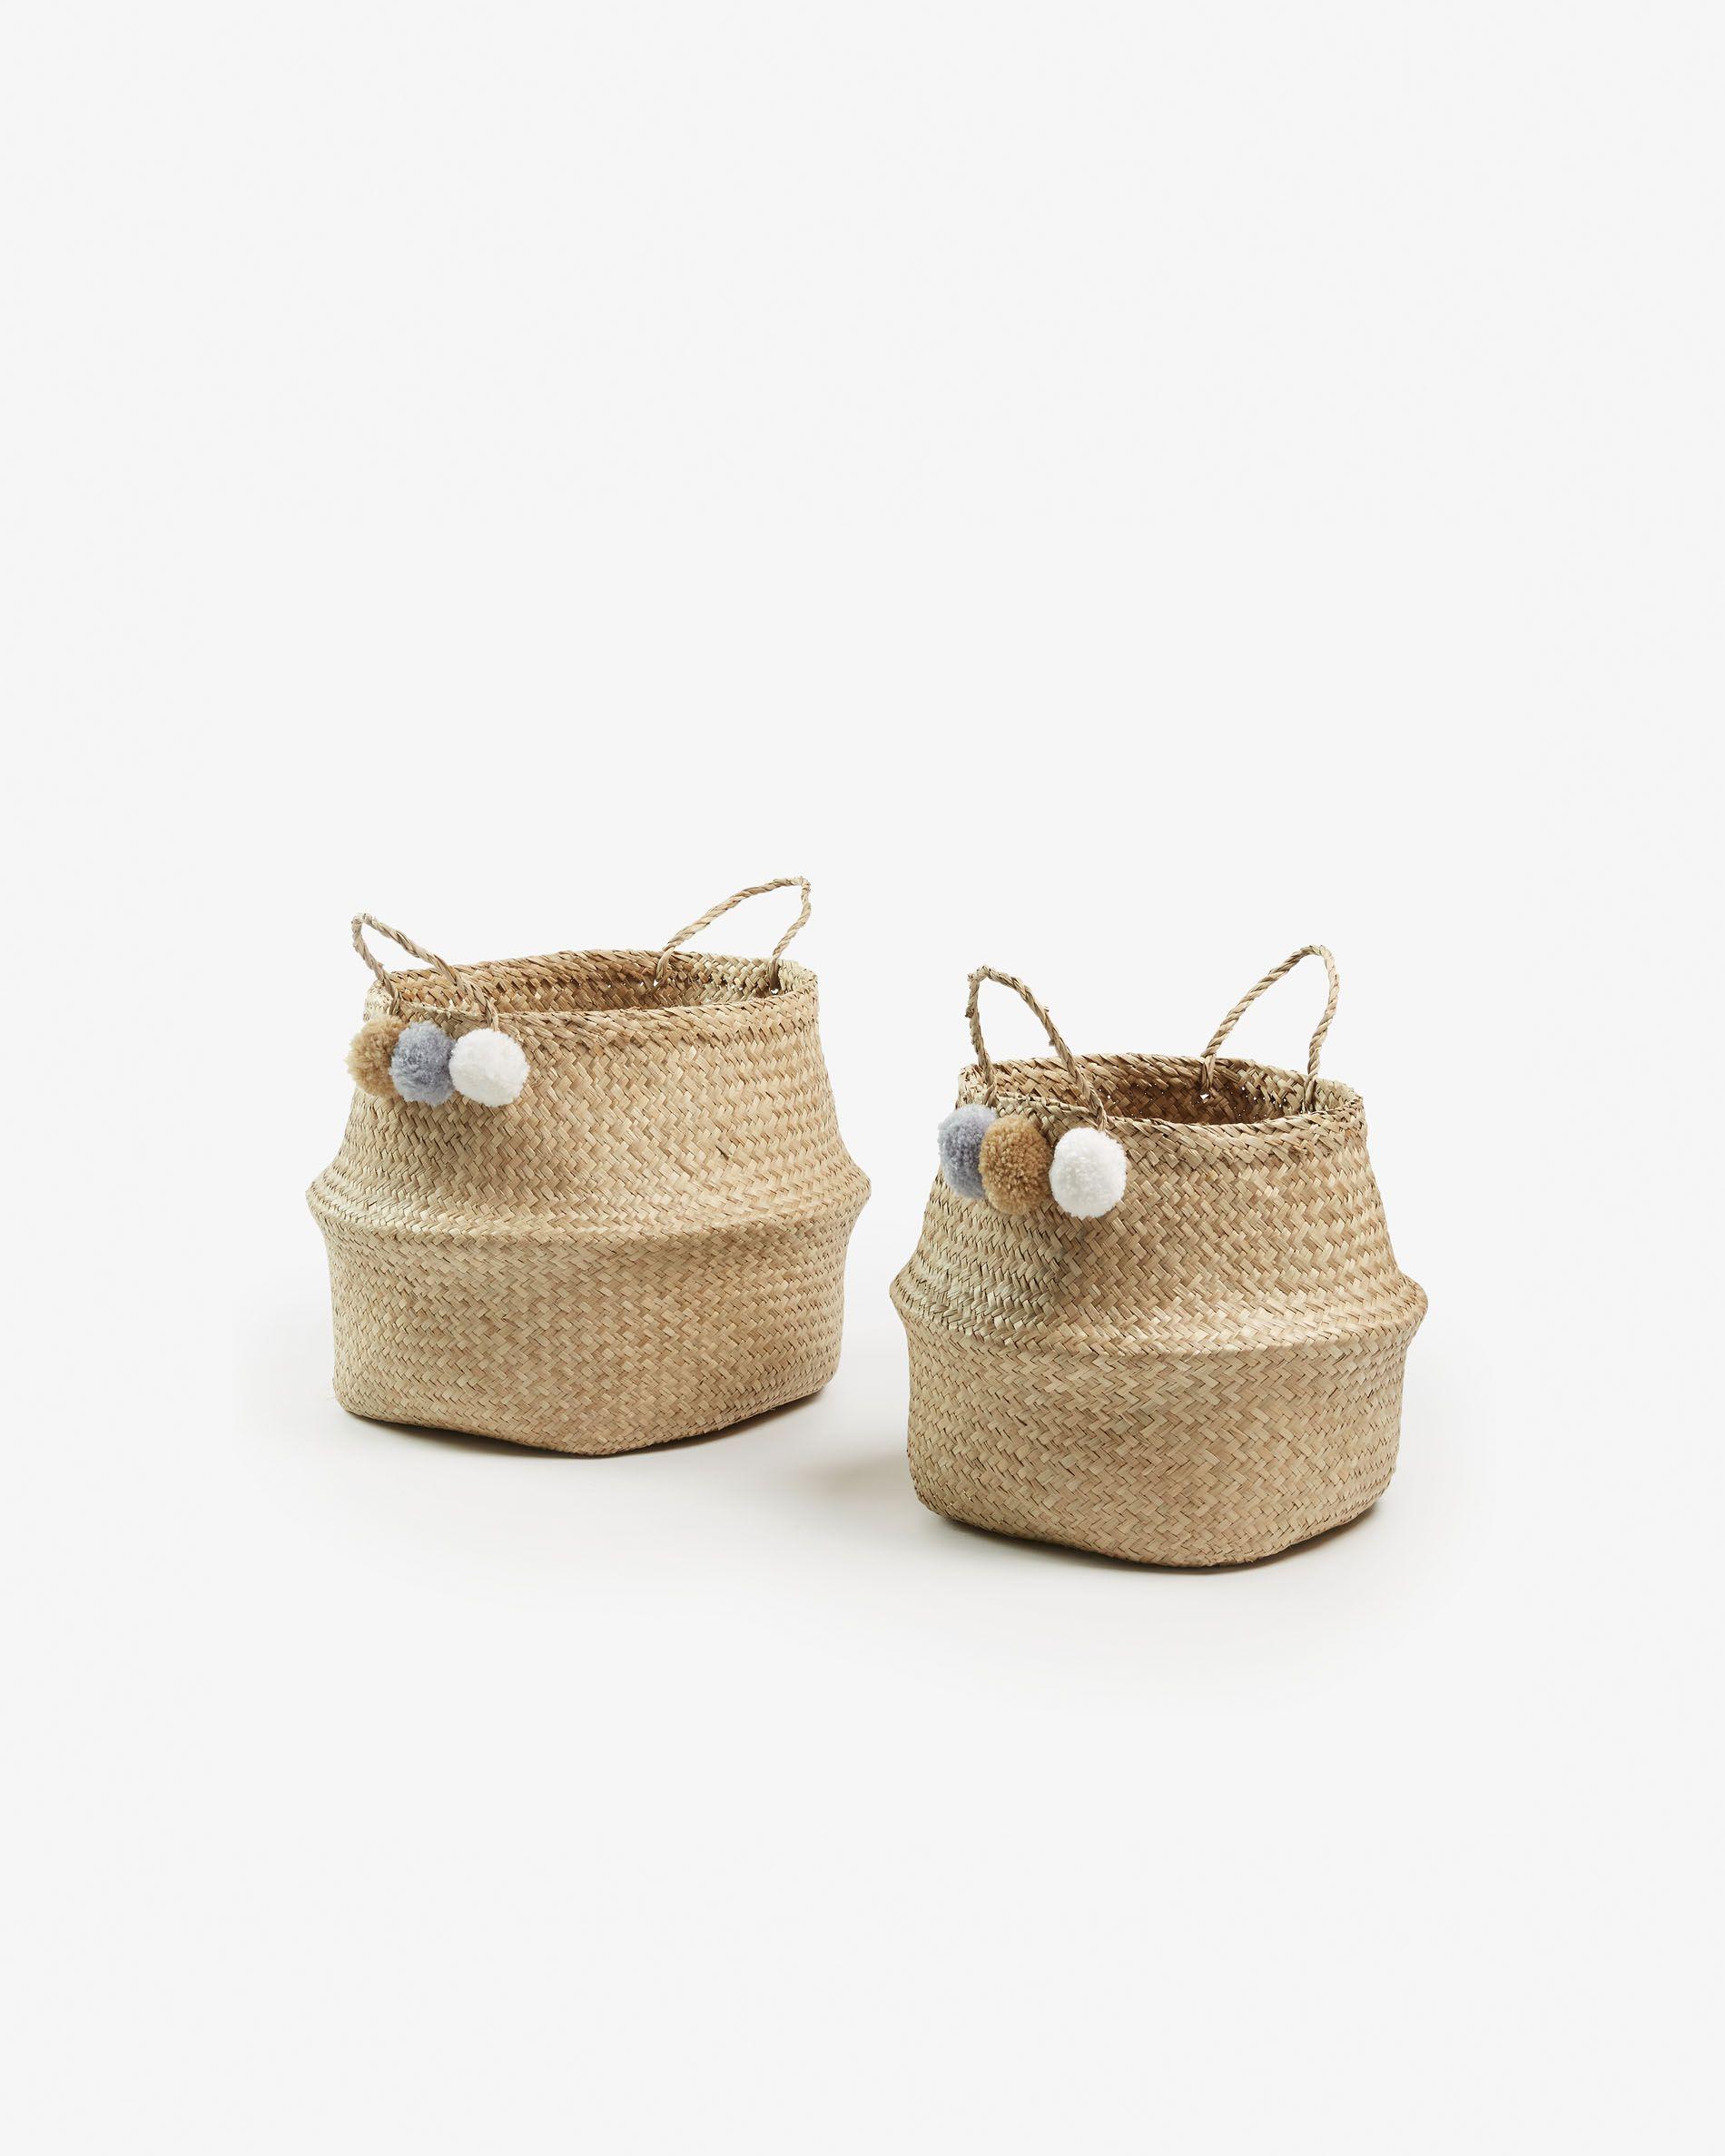 Set de 2 cestas en fibra vegetal natural con pompones.